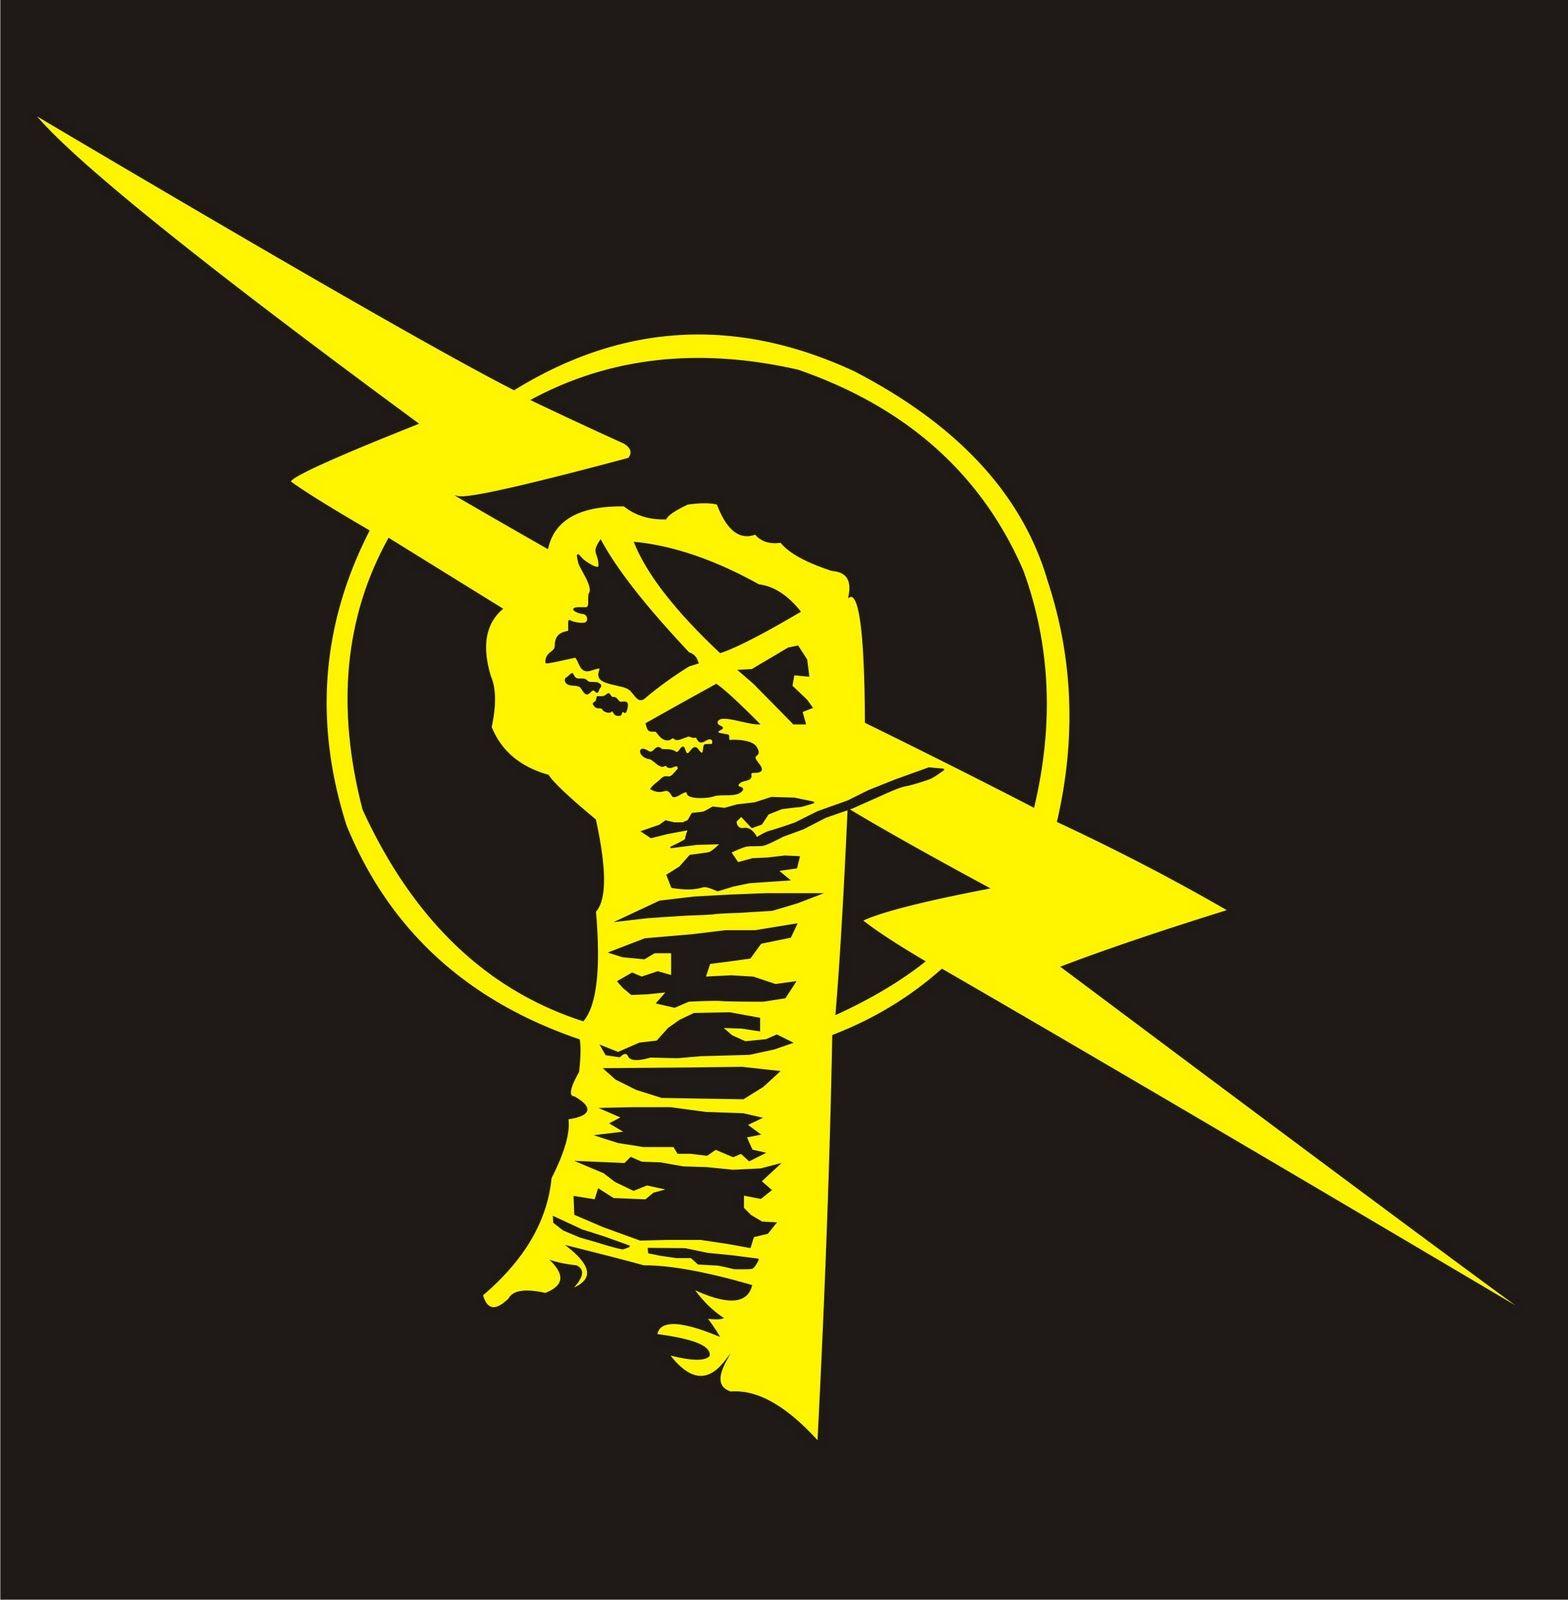 Cult Of Personality Logos I Like Pinterest Cm Punk Wwe Logo